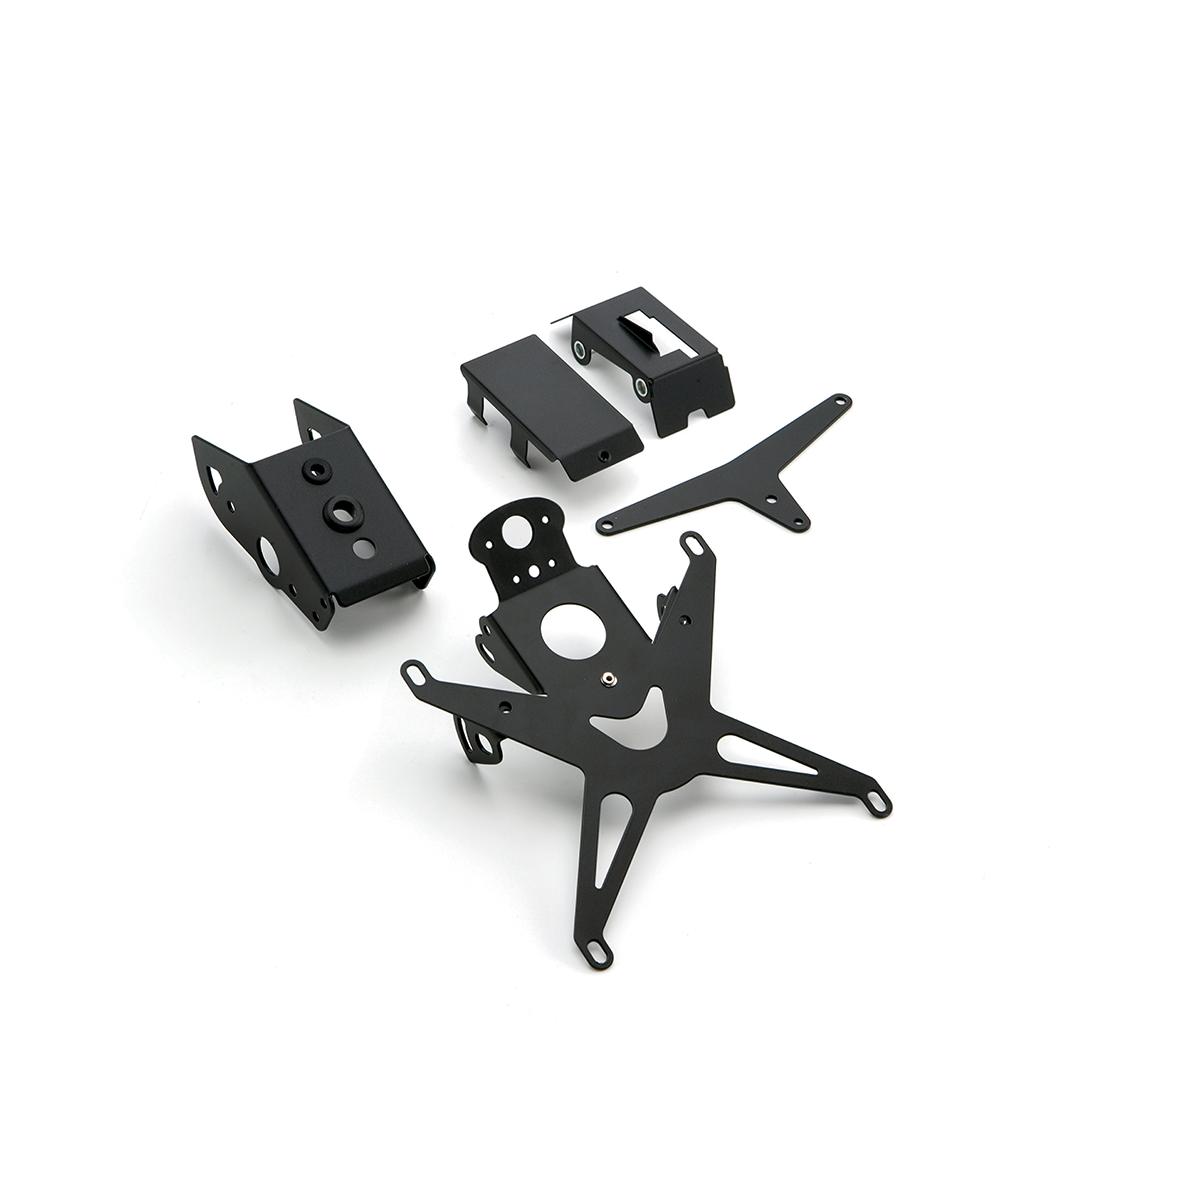 kennzeichentr ger racing aluminium f r aprilia dorsoduro. Black Bedroom Furniture Sets. Home Design Ideas